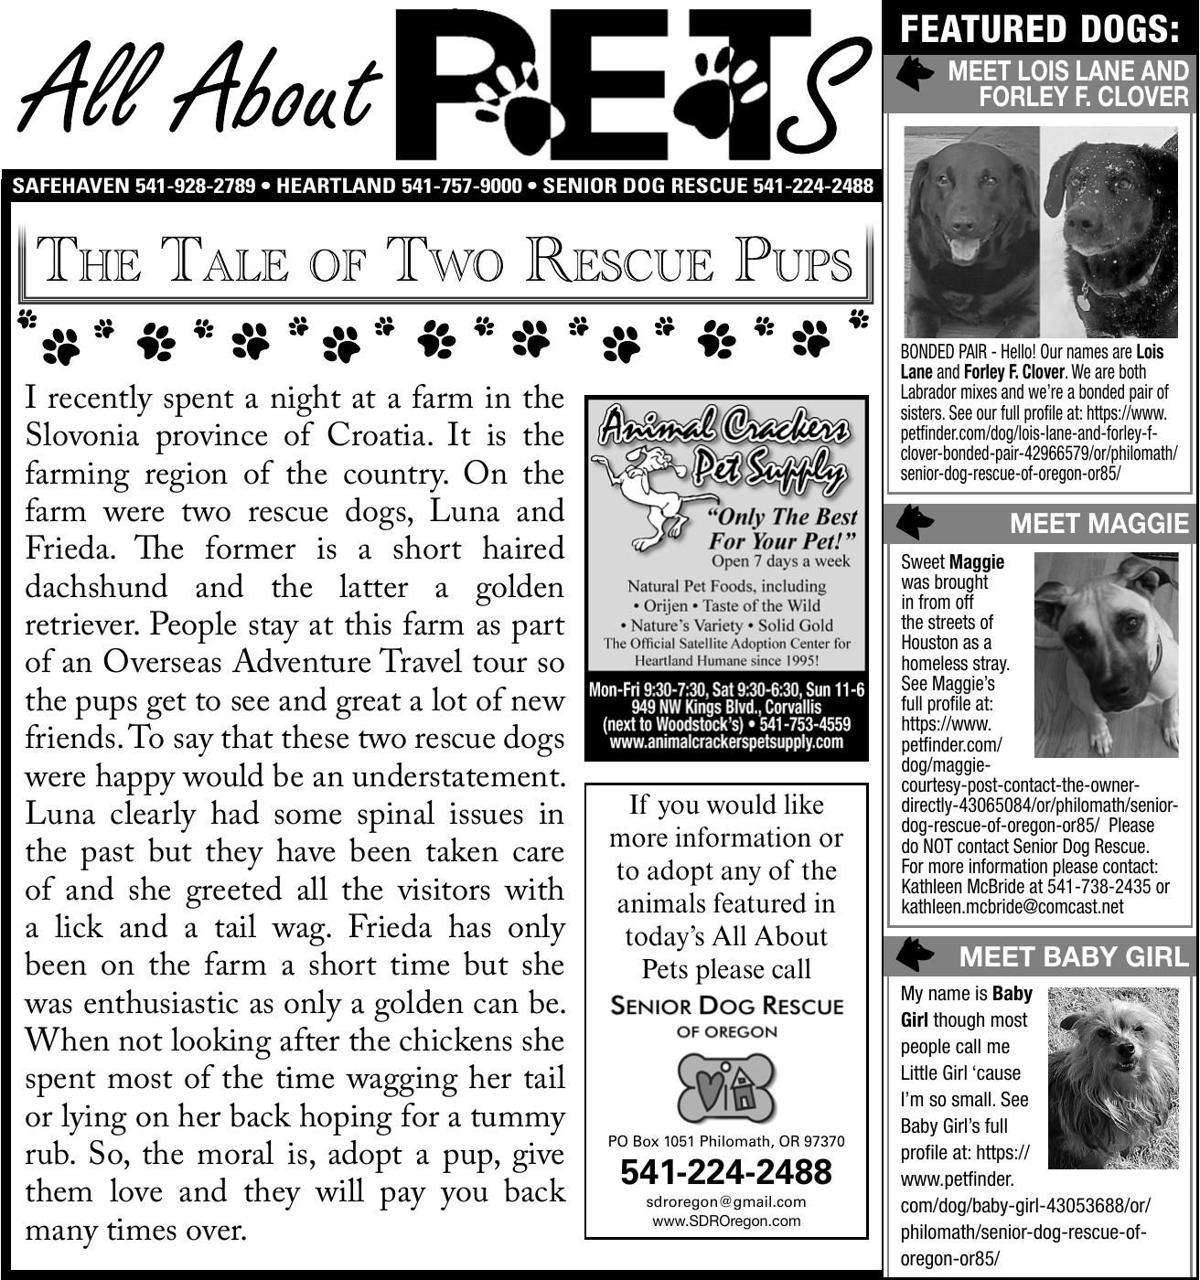 83251-1 pdf | Ad Vault | democratherald com